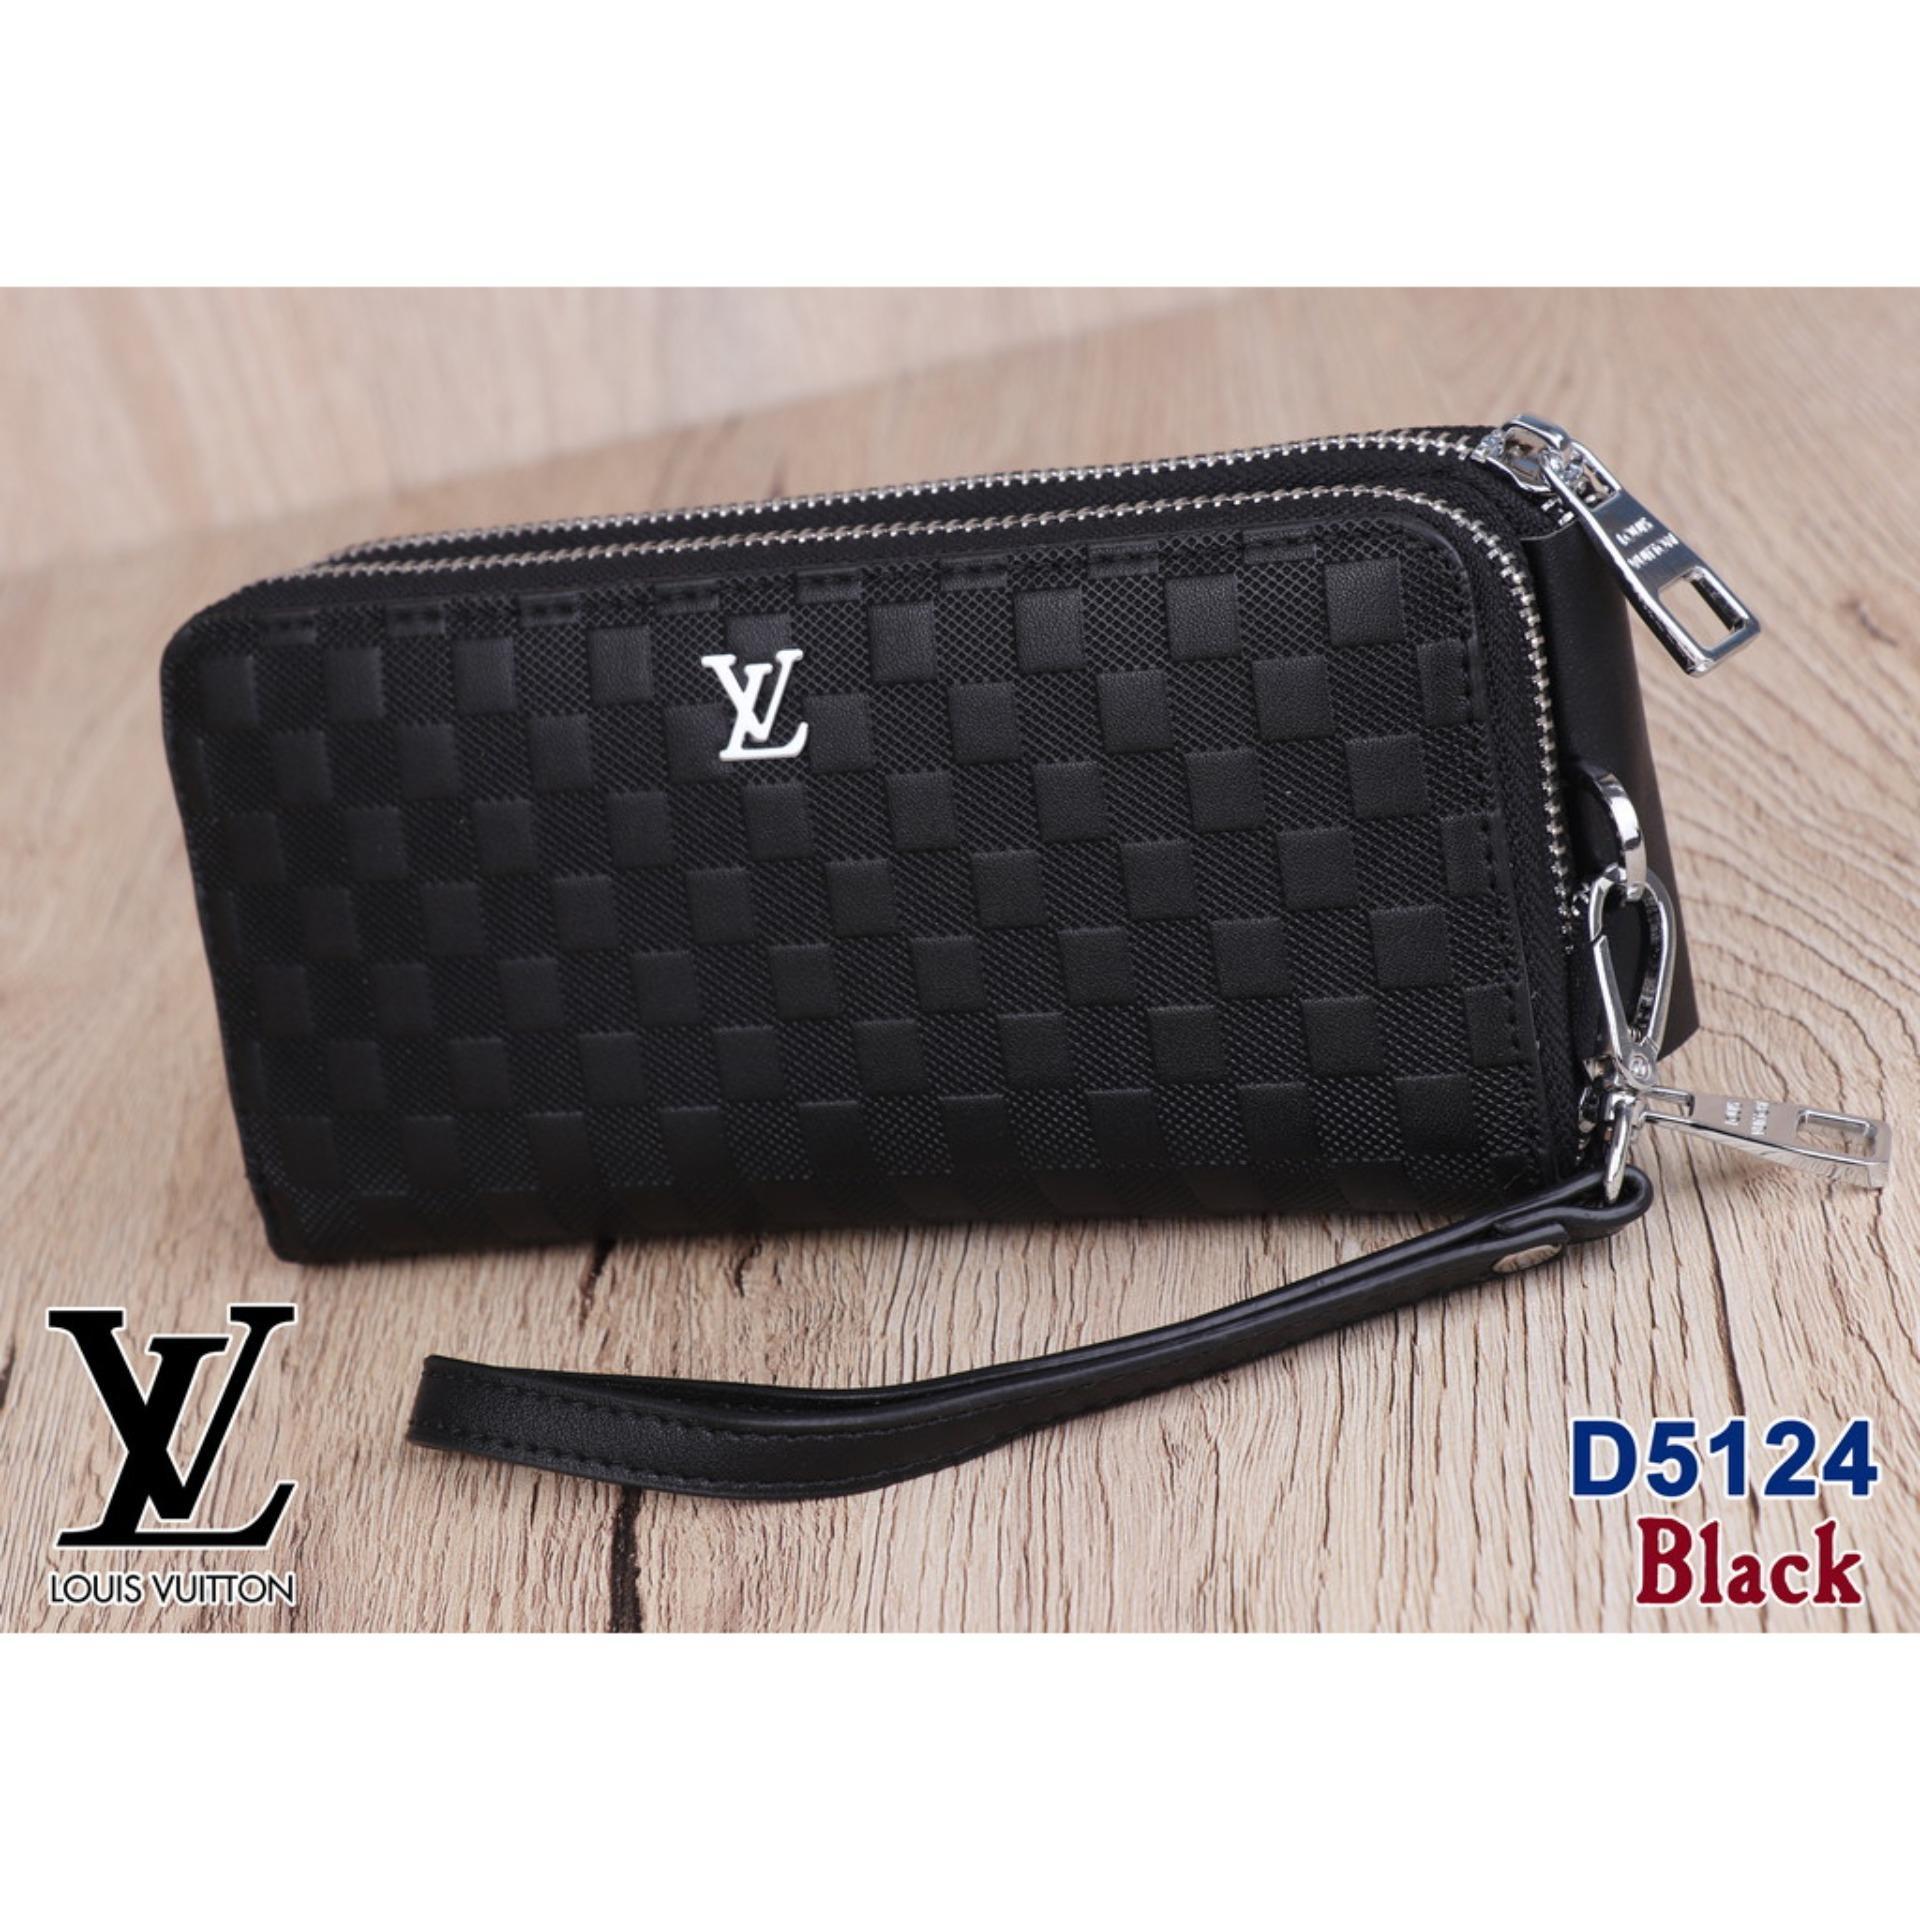 dea151553236 HandBag D5124 Kulit Emboss 2 Zipper Grosir Tas Wanita Bag Fashion Branded  Import Batam Berkualitas